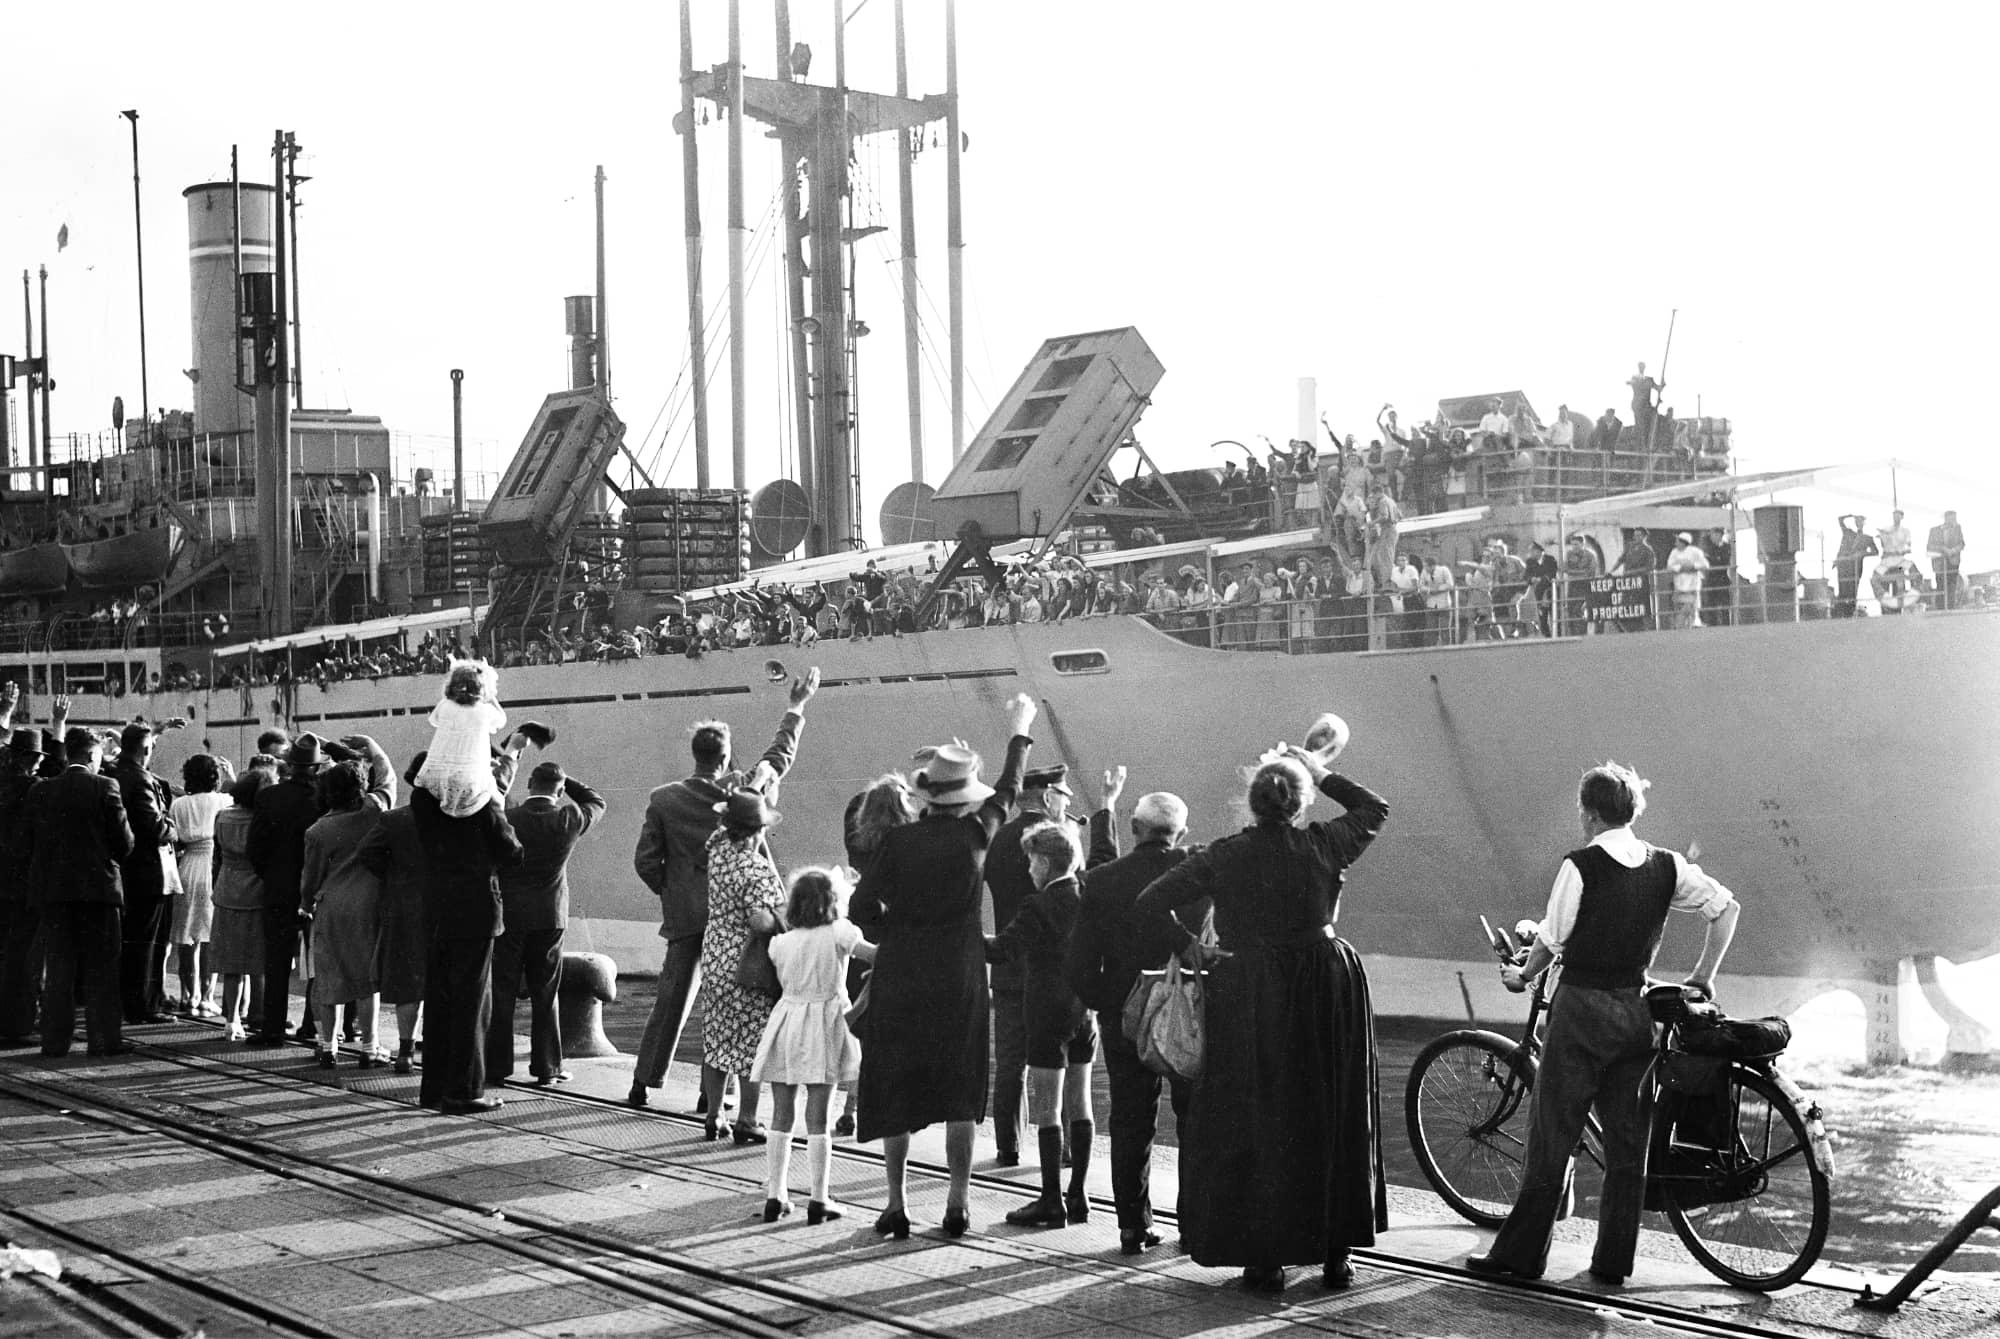 Foto © Daniël van de Ven, Rotterdam haven 1926